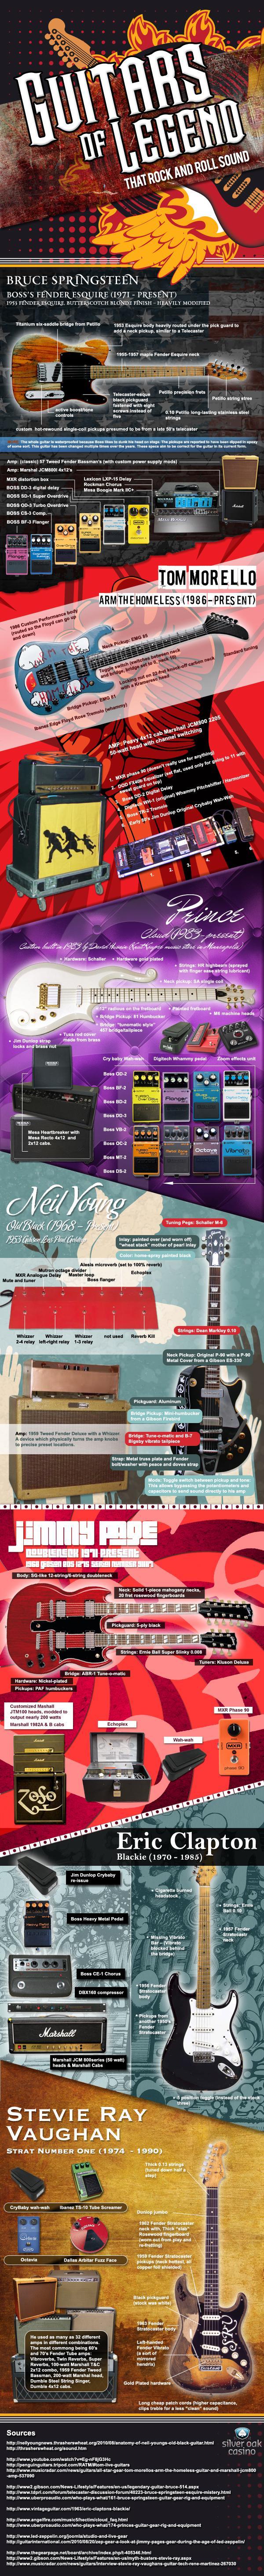 90 Of The Best Guitar Websites Chalk Electric Parts Diagram Pickups Http Guitarwiringblogspotcom Guitars Legend Link Image